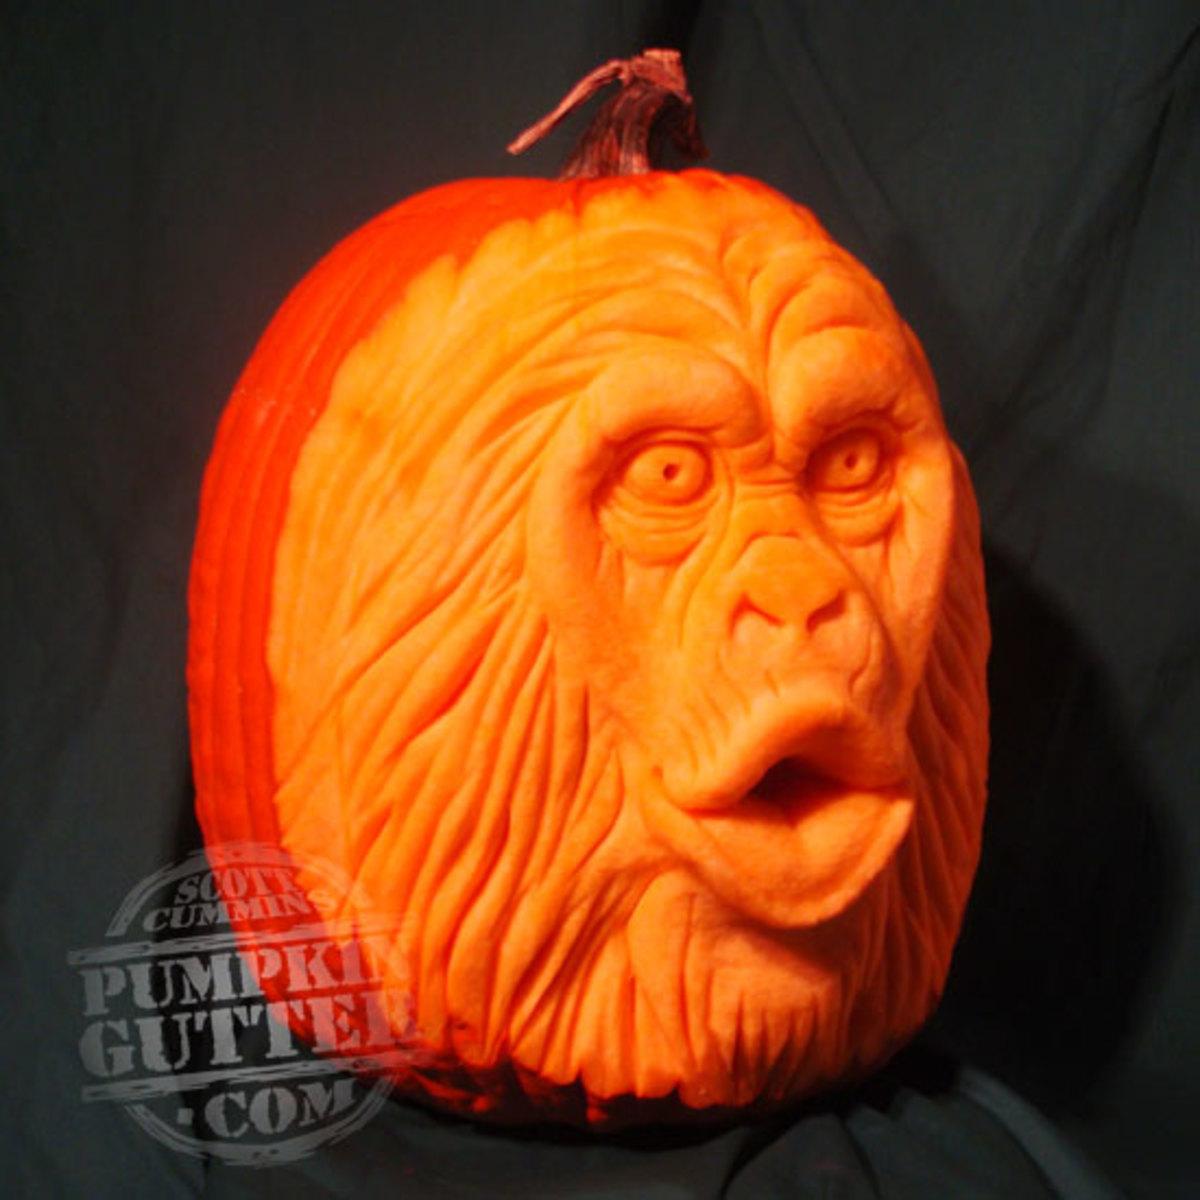 Chimp pumpkin, Planet of the Apes?,